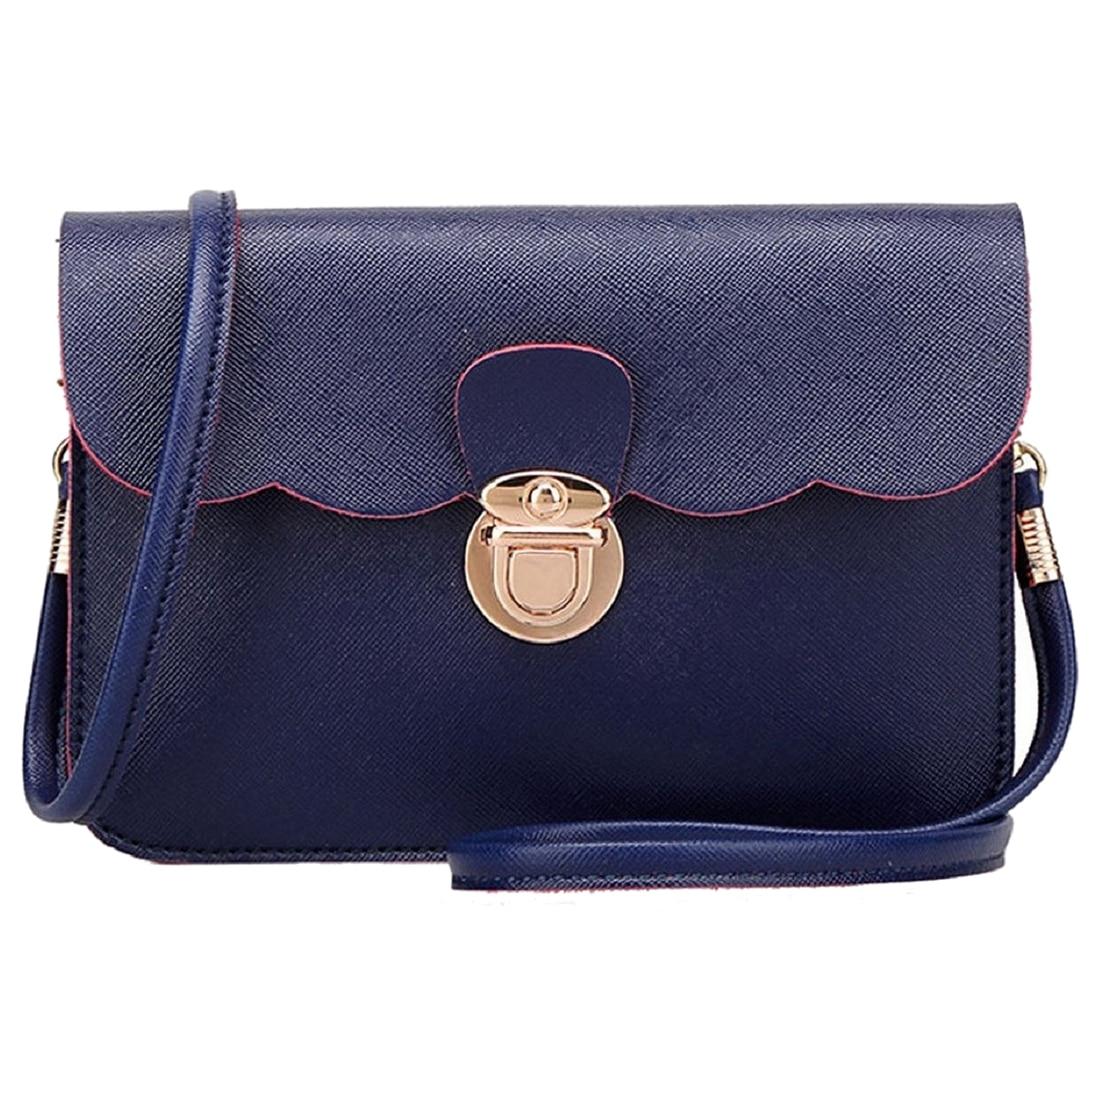 BEAU Fashion Women's PU Leather Shoulder Bag Clutch Handbag Tote Purse Hobo Messenger (Deep Blue) women s fashion pu leather messenger hobo handbag purse shoulder bag purse lady tote black